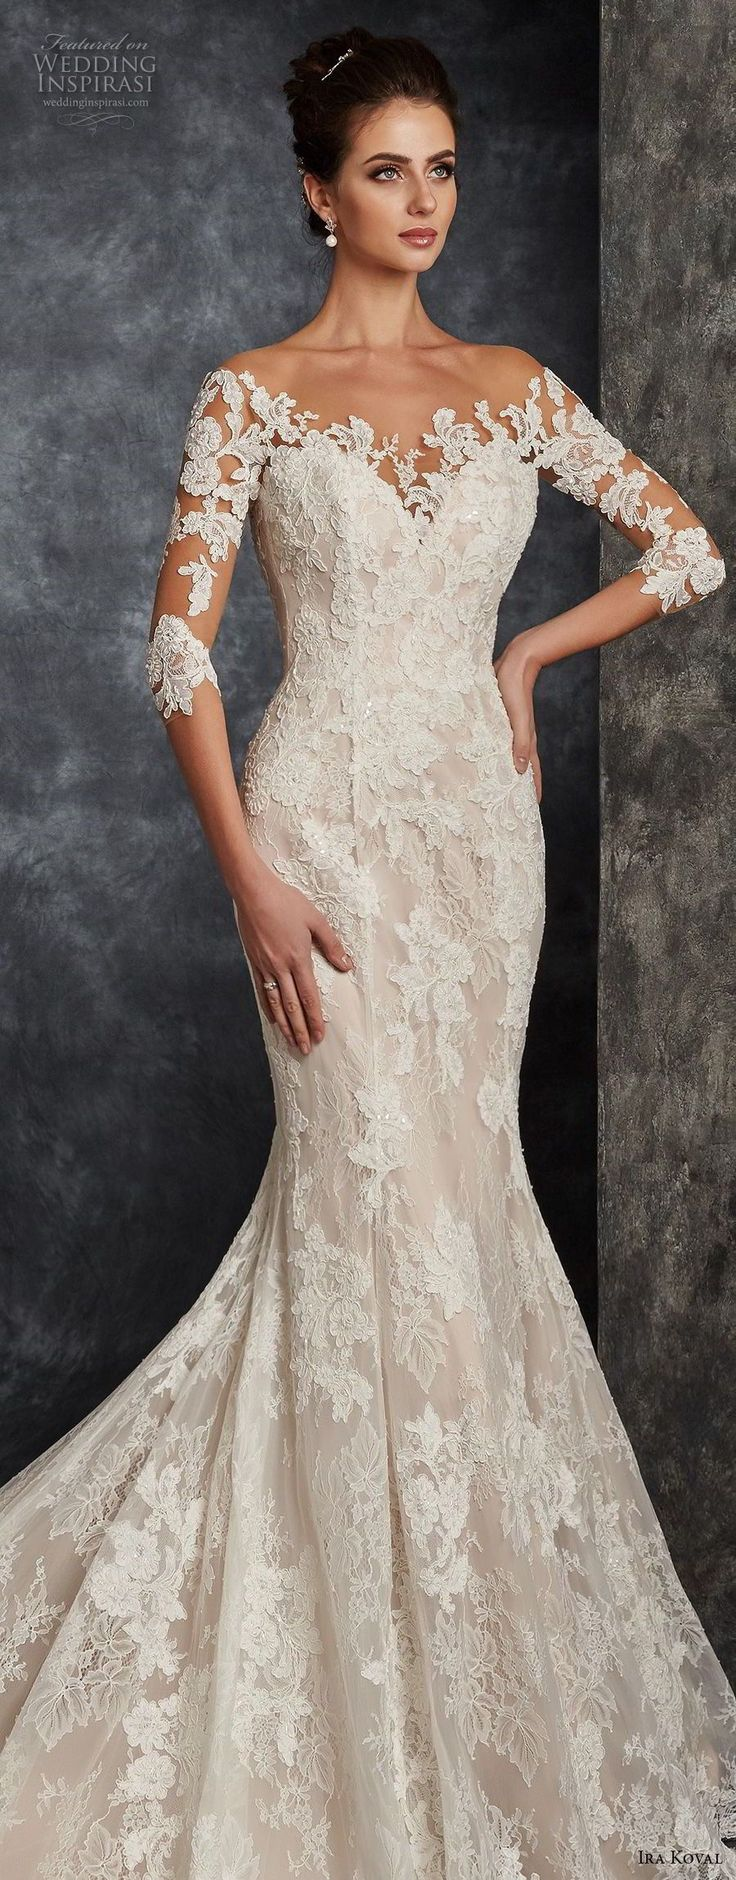 ira koval 2017 bridal three quarter sleeves sweetheart neckline full lace embell…